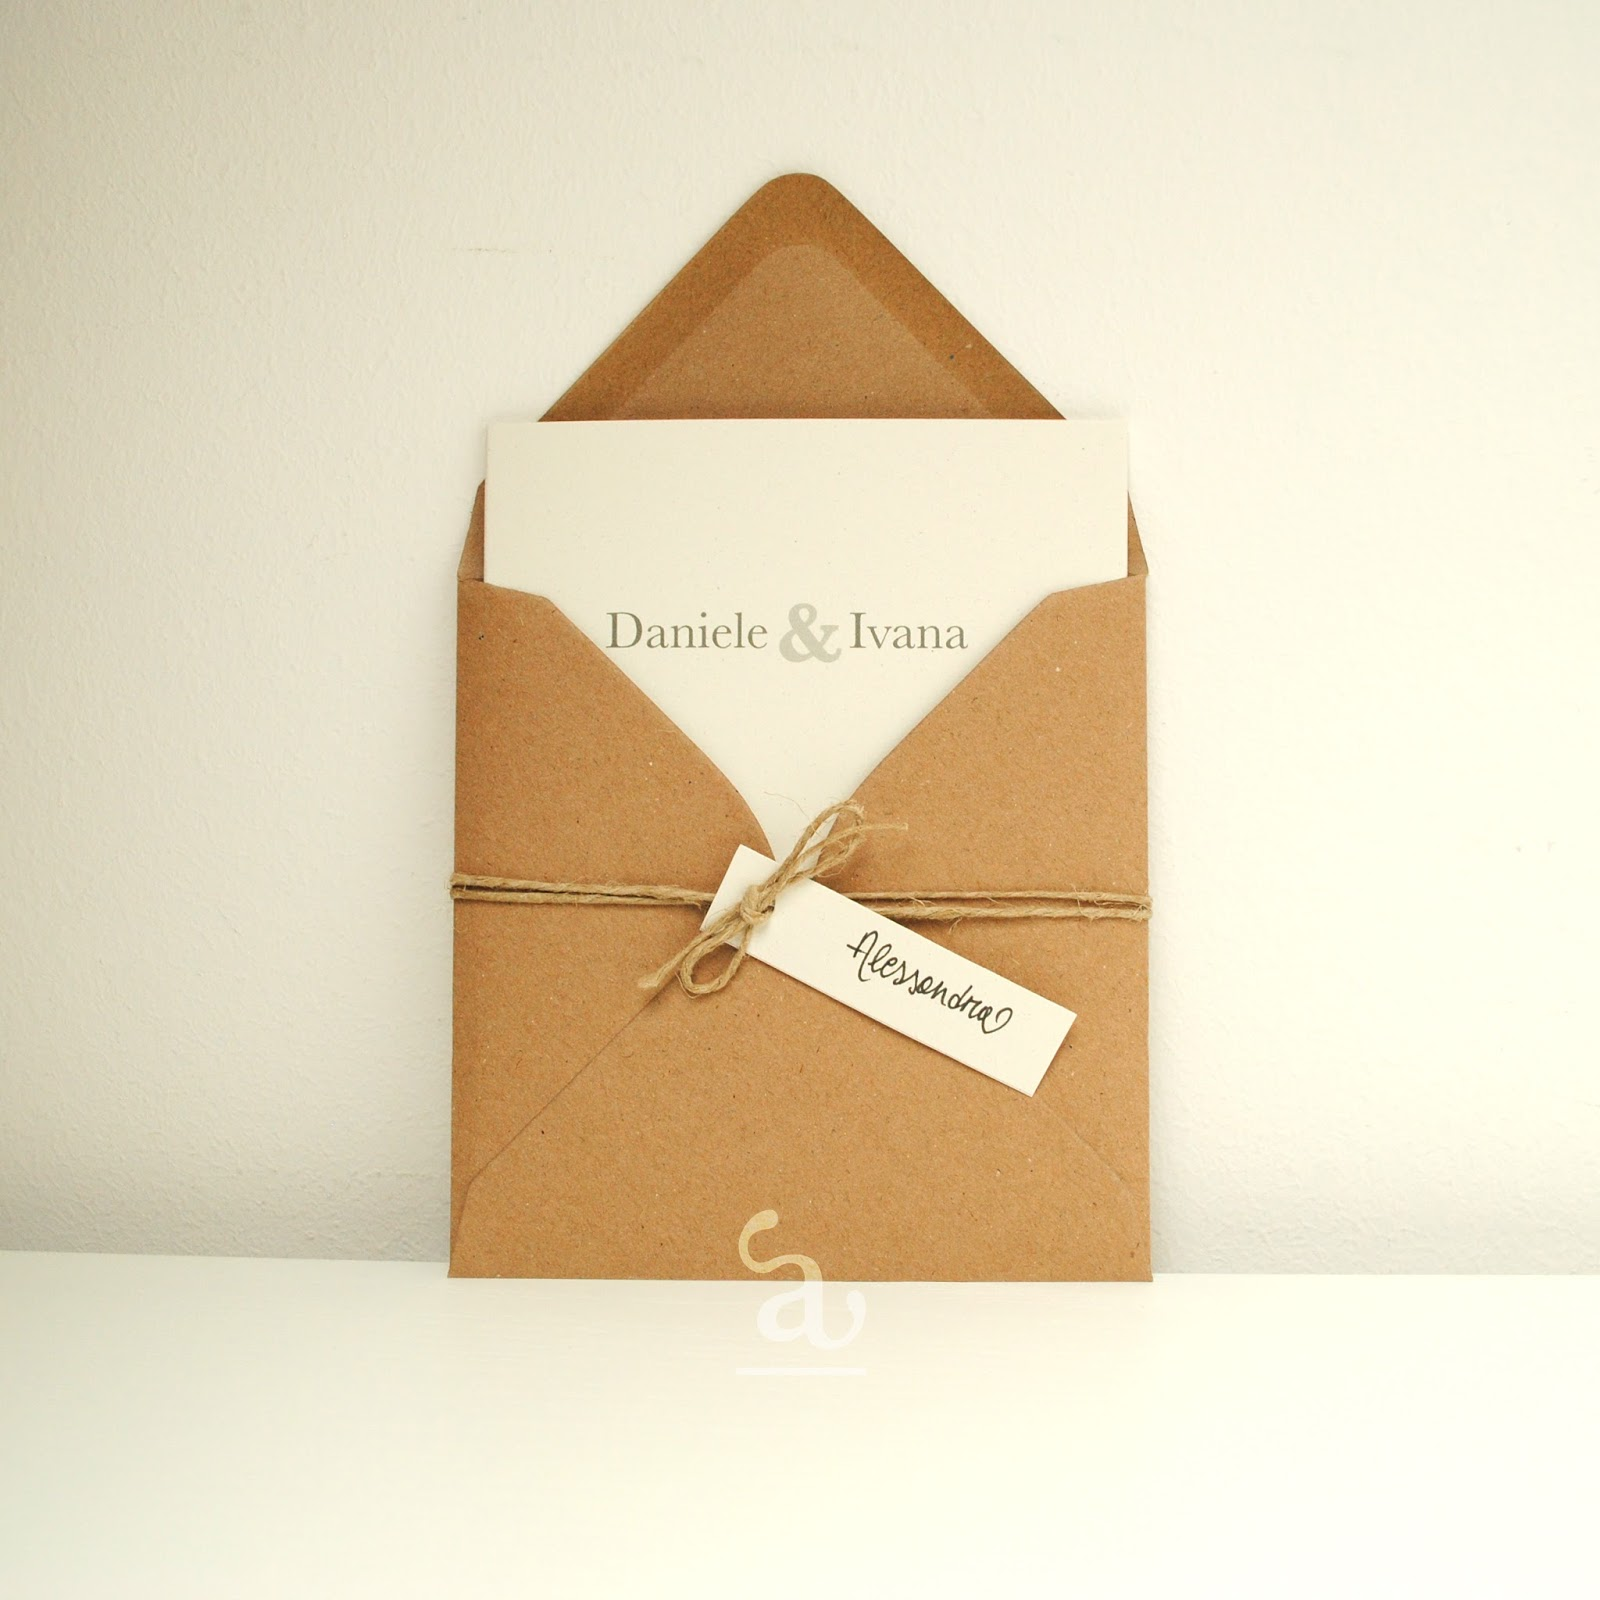 Eccezionale Wedding suite Daniele&Ivana ZN62